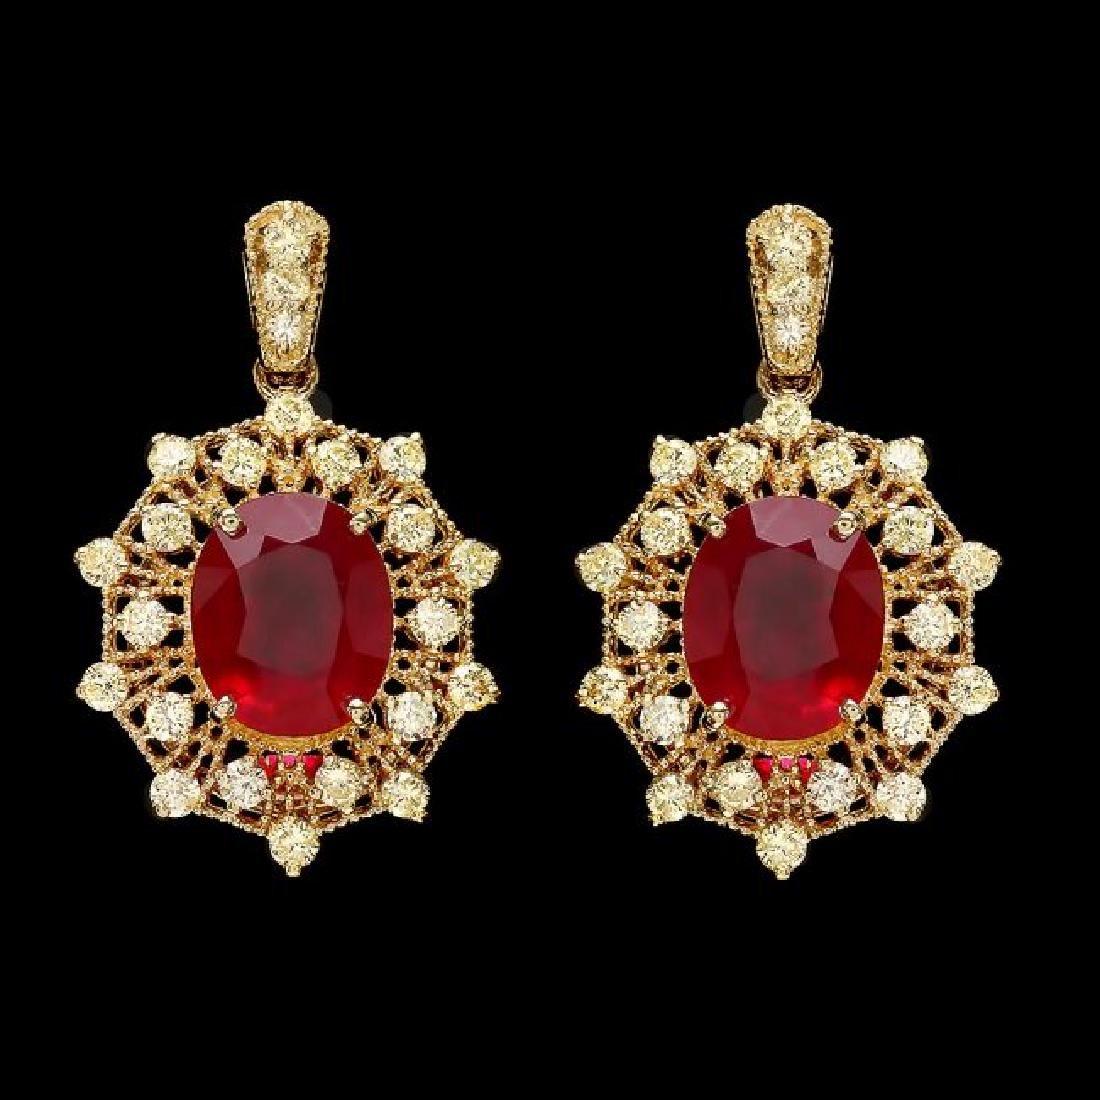 14k Gold 11.00ct Ruby 2.00ct Diamond Earrings - 2